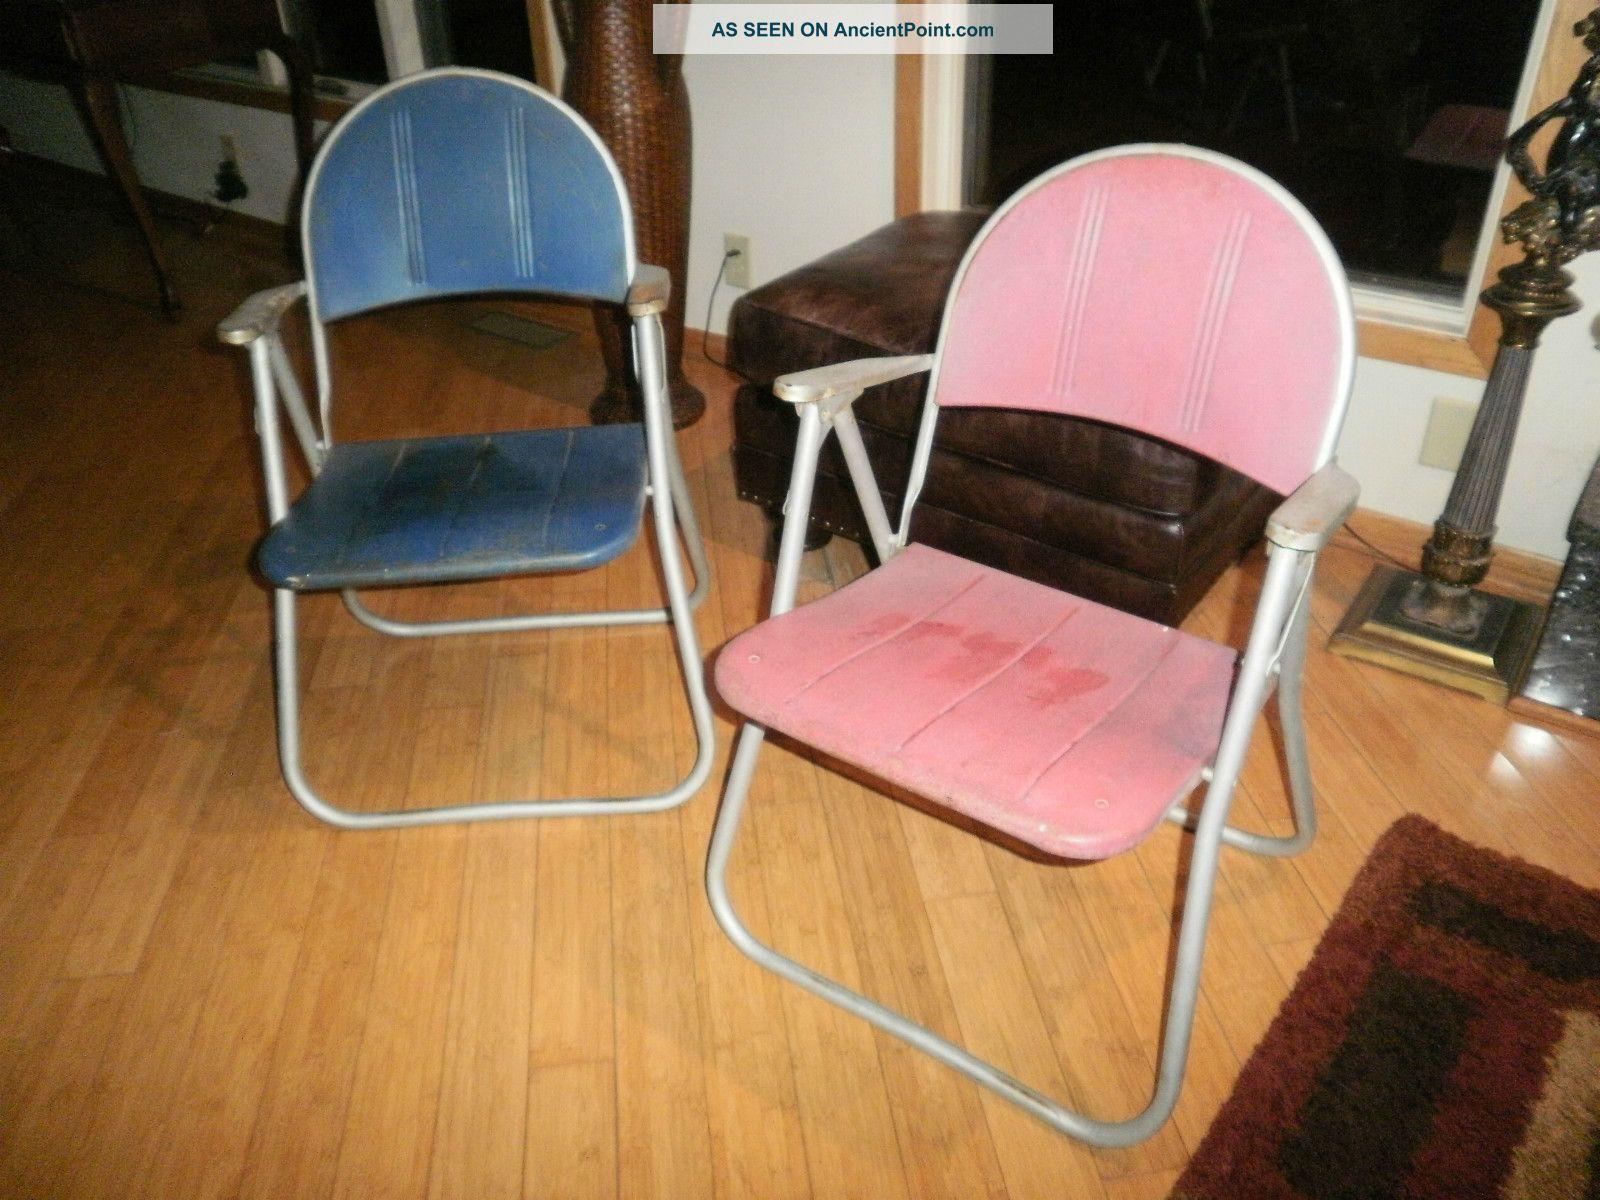 Vntg Folding Metal Patio Lawn Chair Mid Century Samsonite? Russel Wright? Antiqu Post-1950 photo